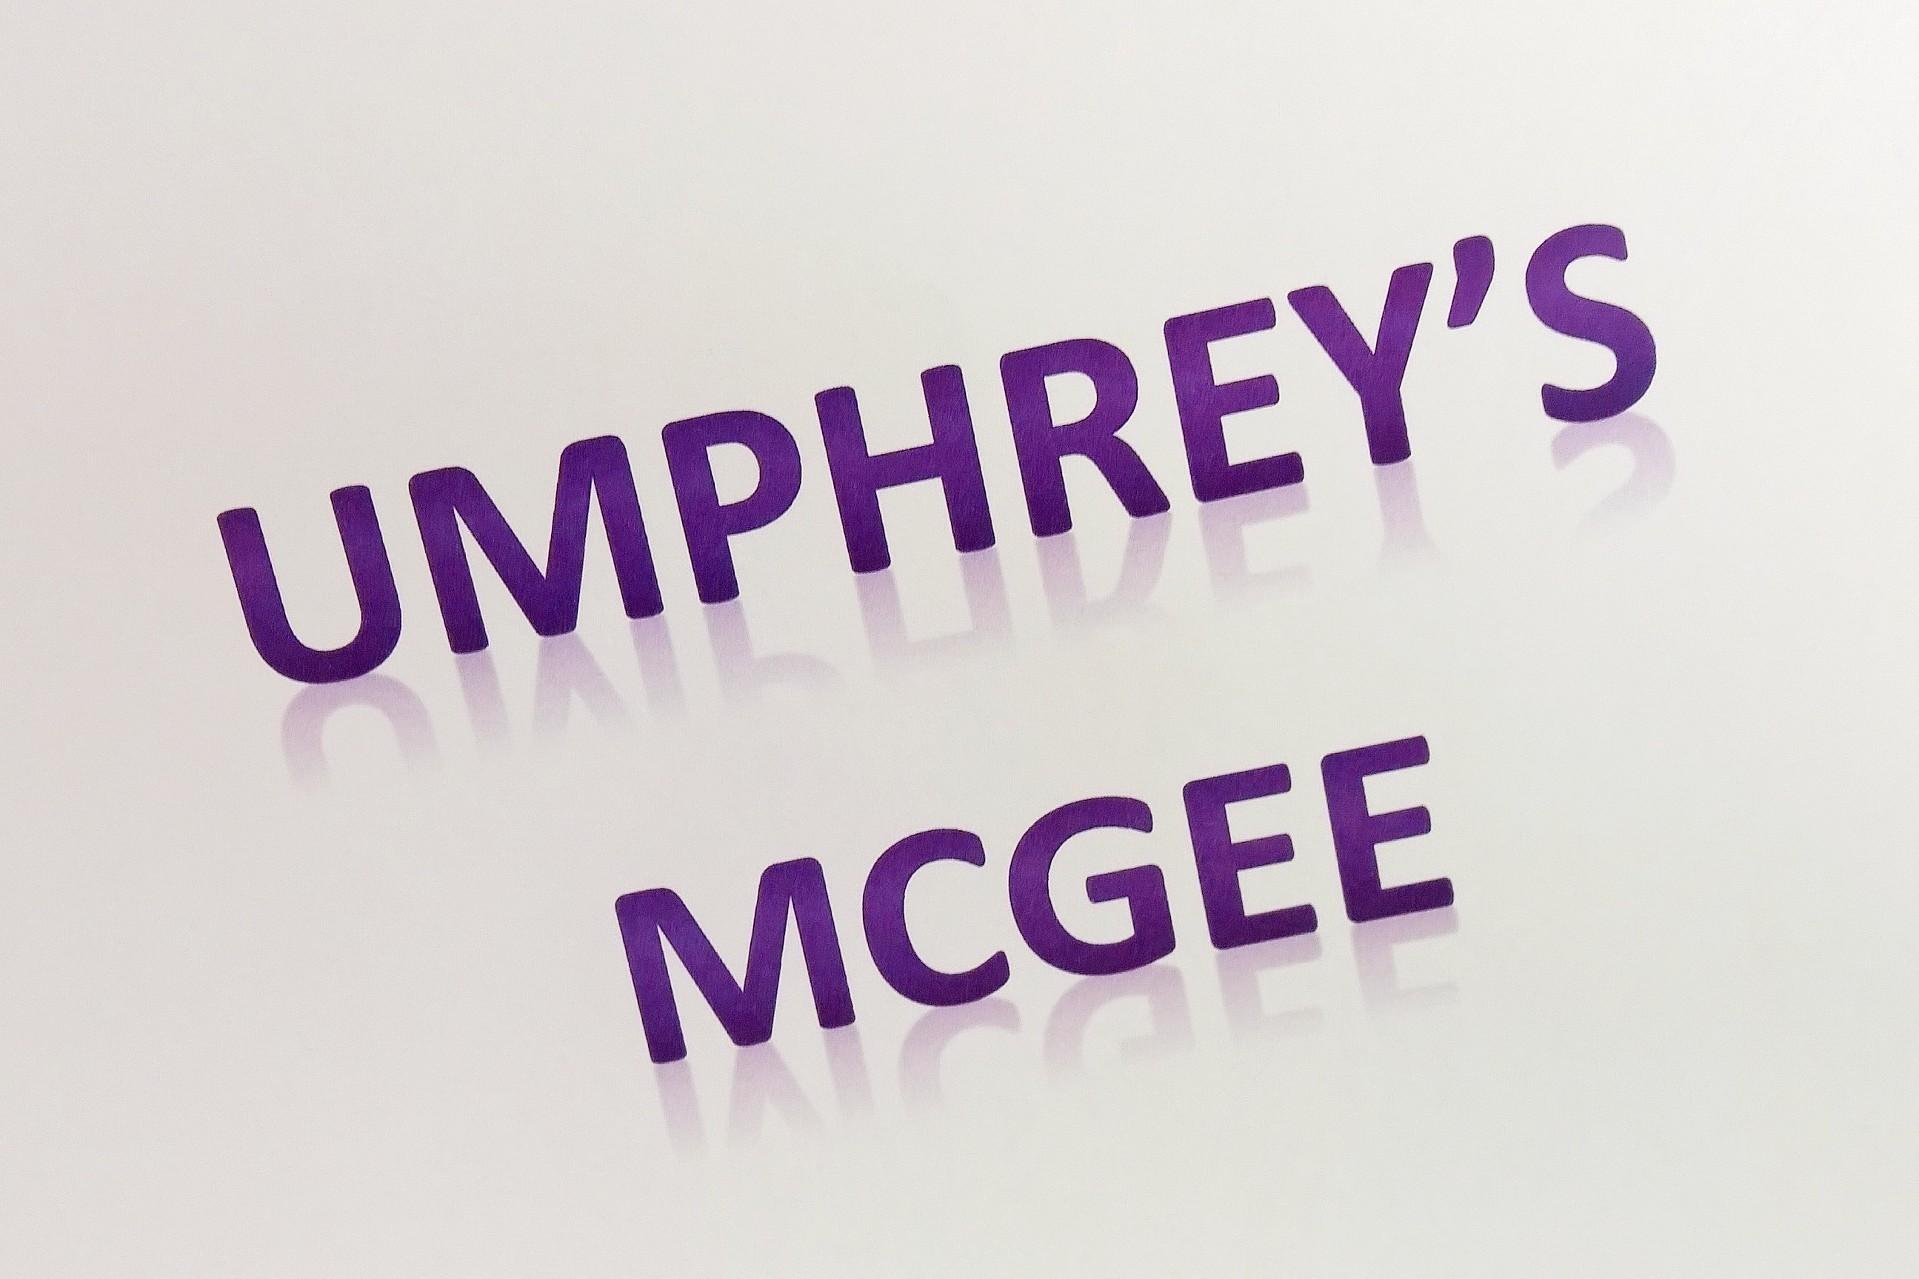 Umphrey's McGee, June 21 2014